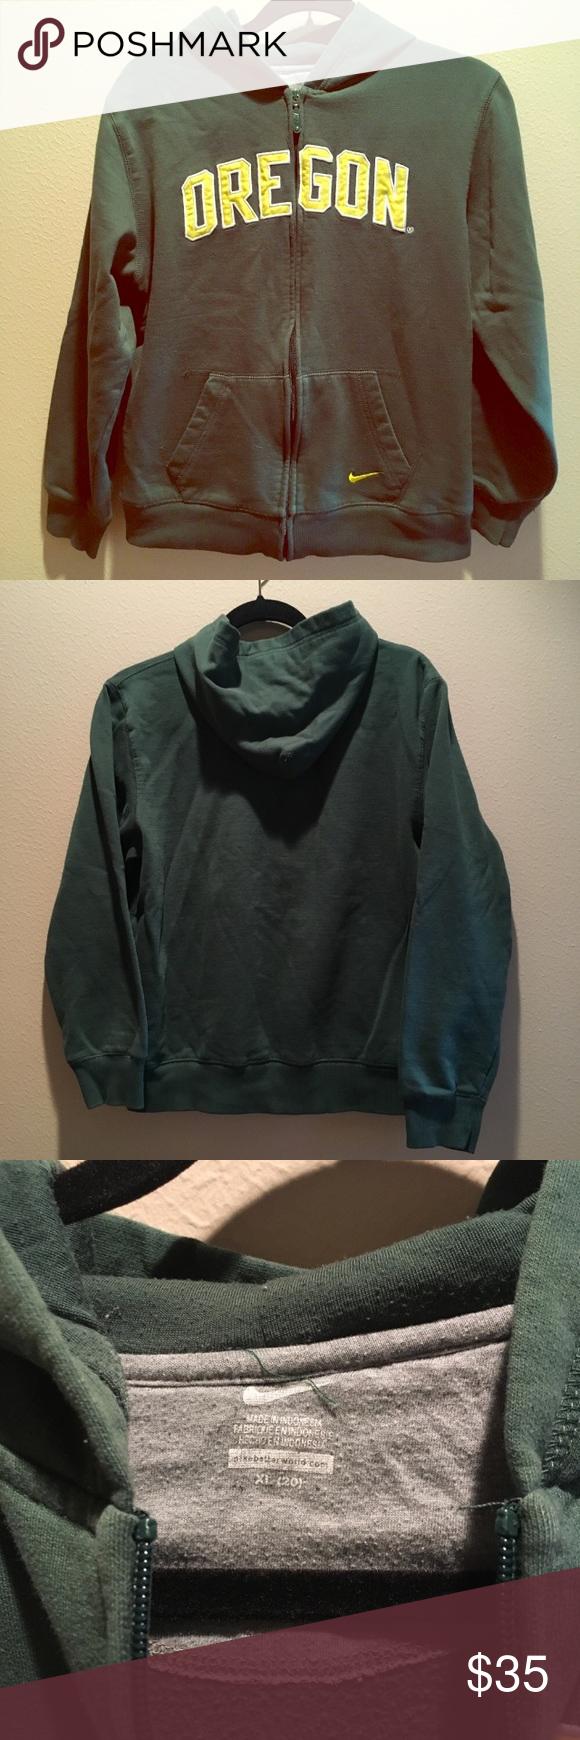 Sports Mem, Cards & Fan Shop Size S Fan Apparel & Souvenirs Youth Ncaa Oregon State Beavers Black Long Sleeve Shirt